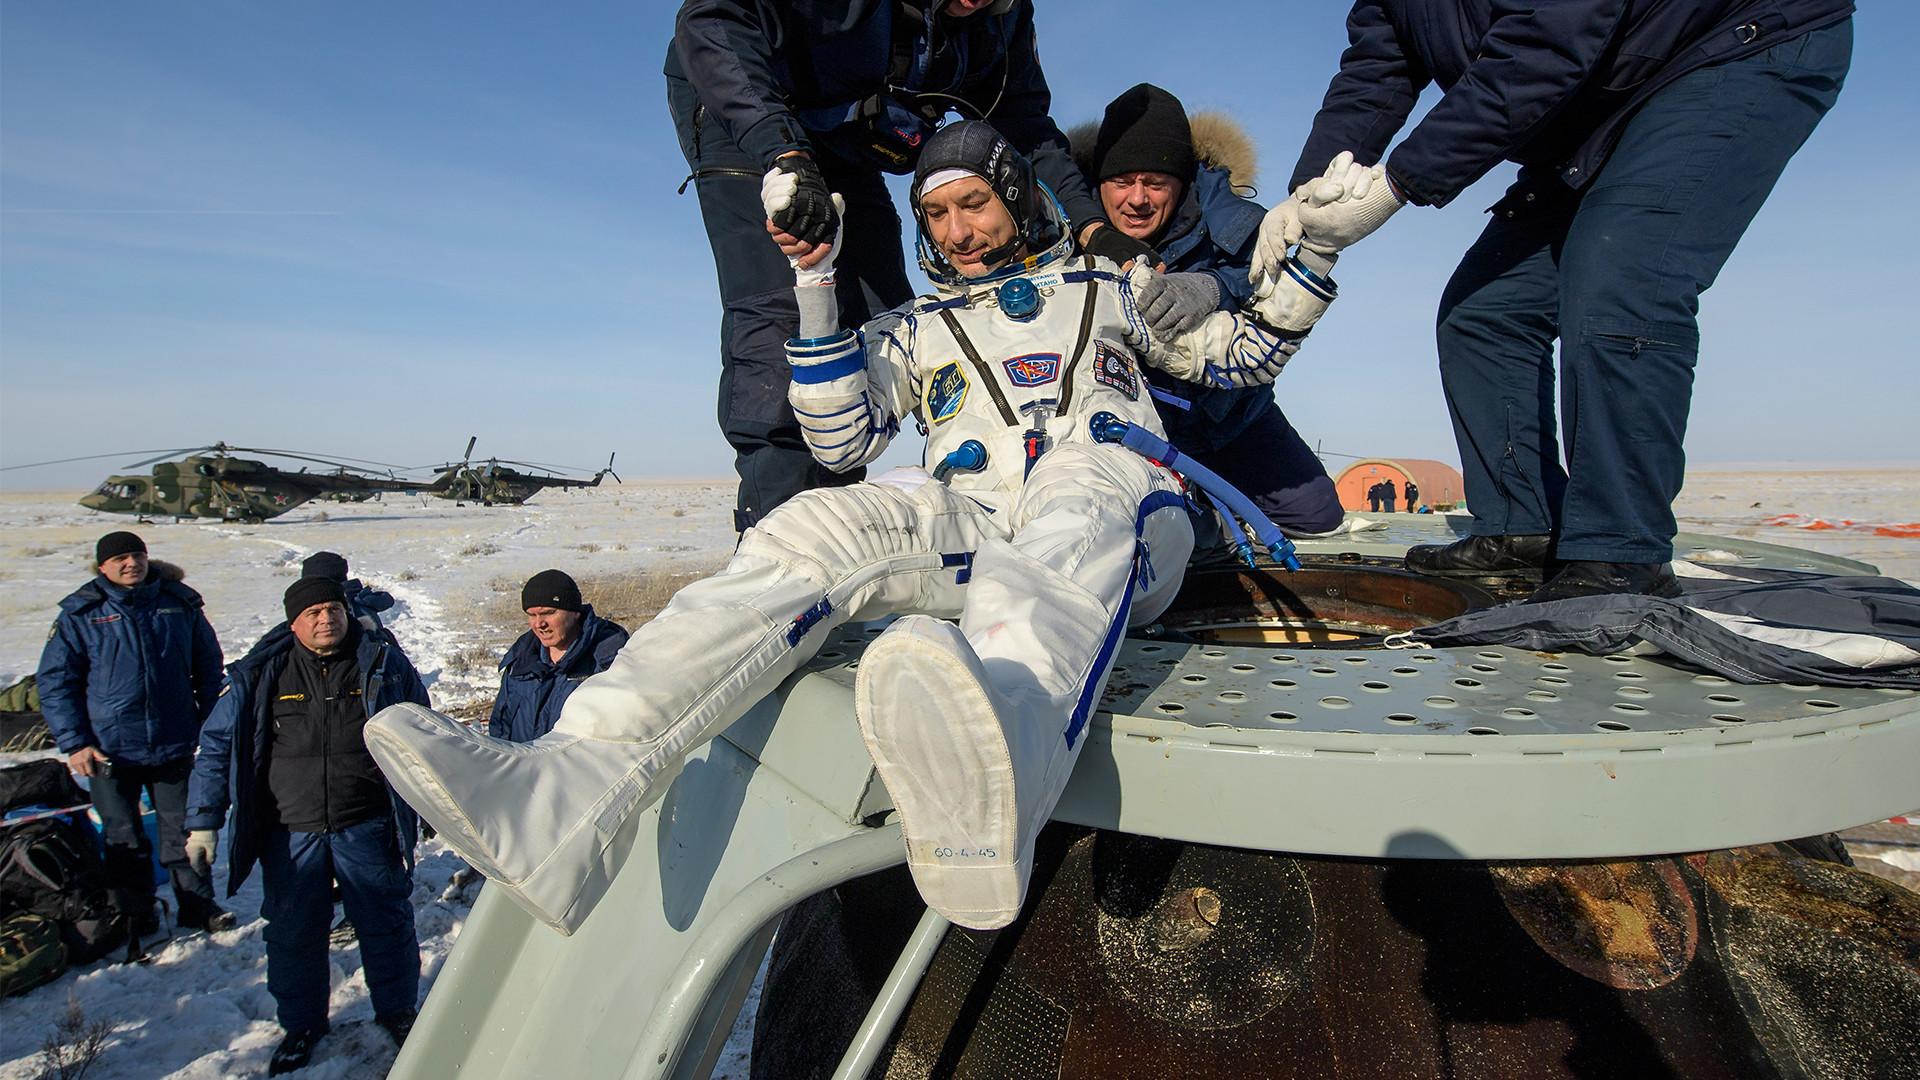 "Астронаут Лука Пармитано уз помоћ спасилаца излази из капсуле брода ""Сојуз МС-13"" само неколико минута након што су он, астронаут агенције НАСА Кристина Кох и космонаут Роскосмоса Александар Скворцов спустили капсулу близу града Жезказган у Казахстану, 6. фебруар 2020."